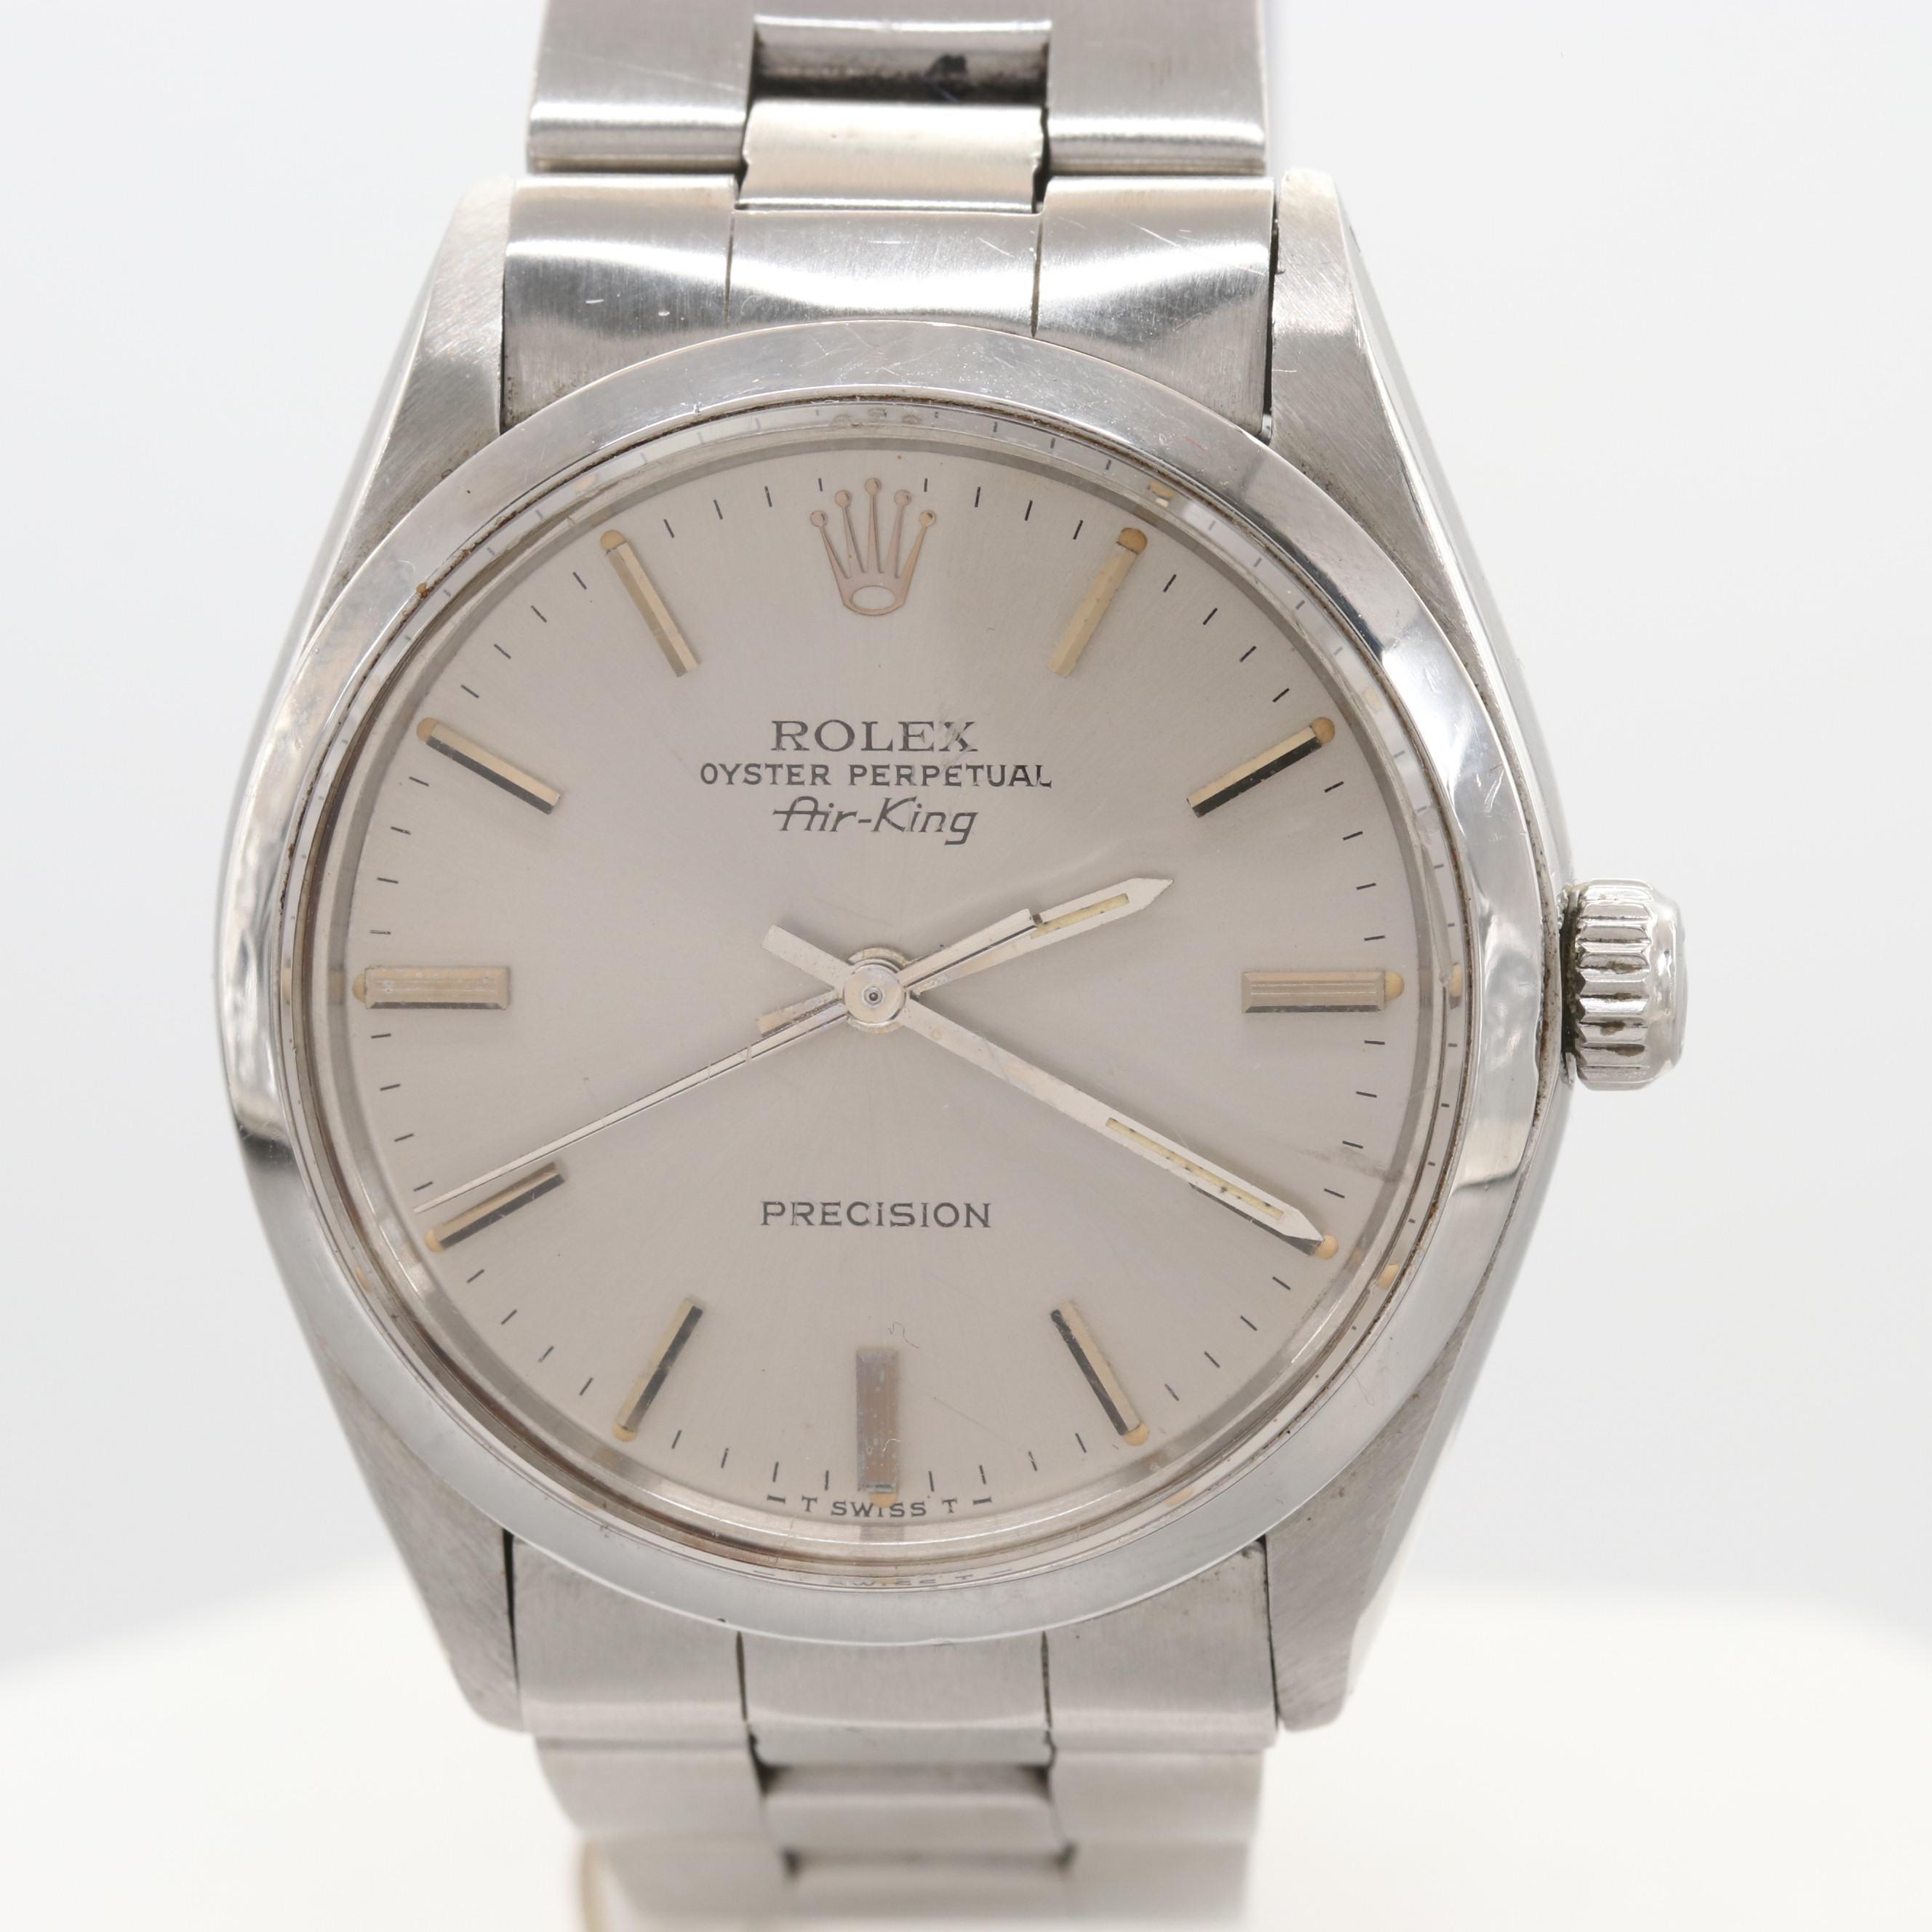 Vintage Rolex Air-King 5500 Stainless Steel Wristwatch